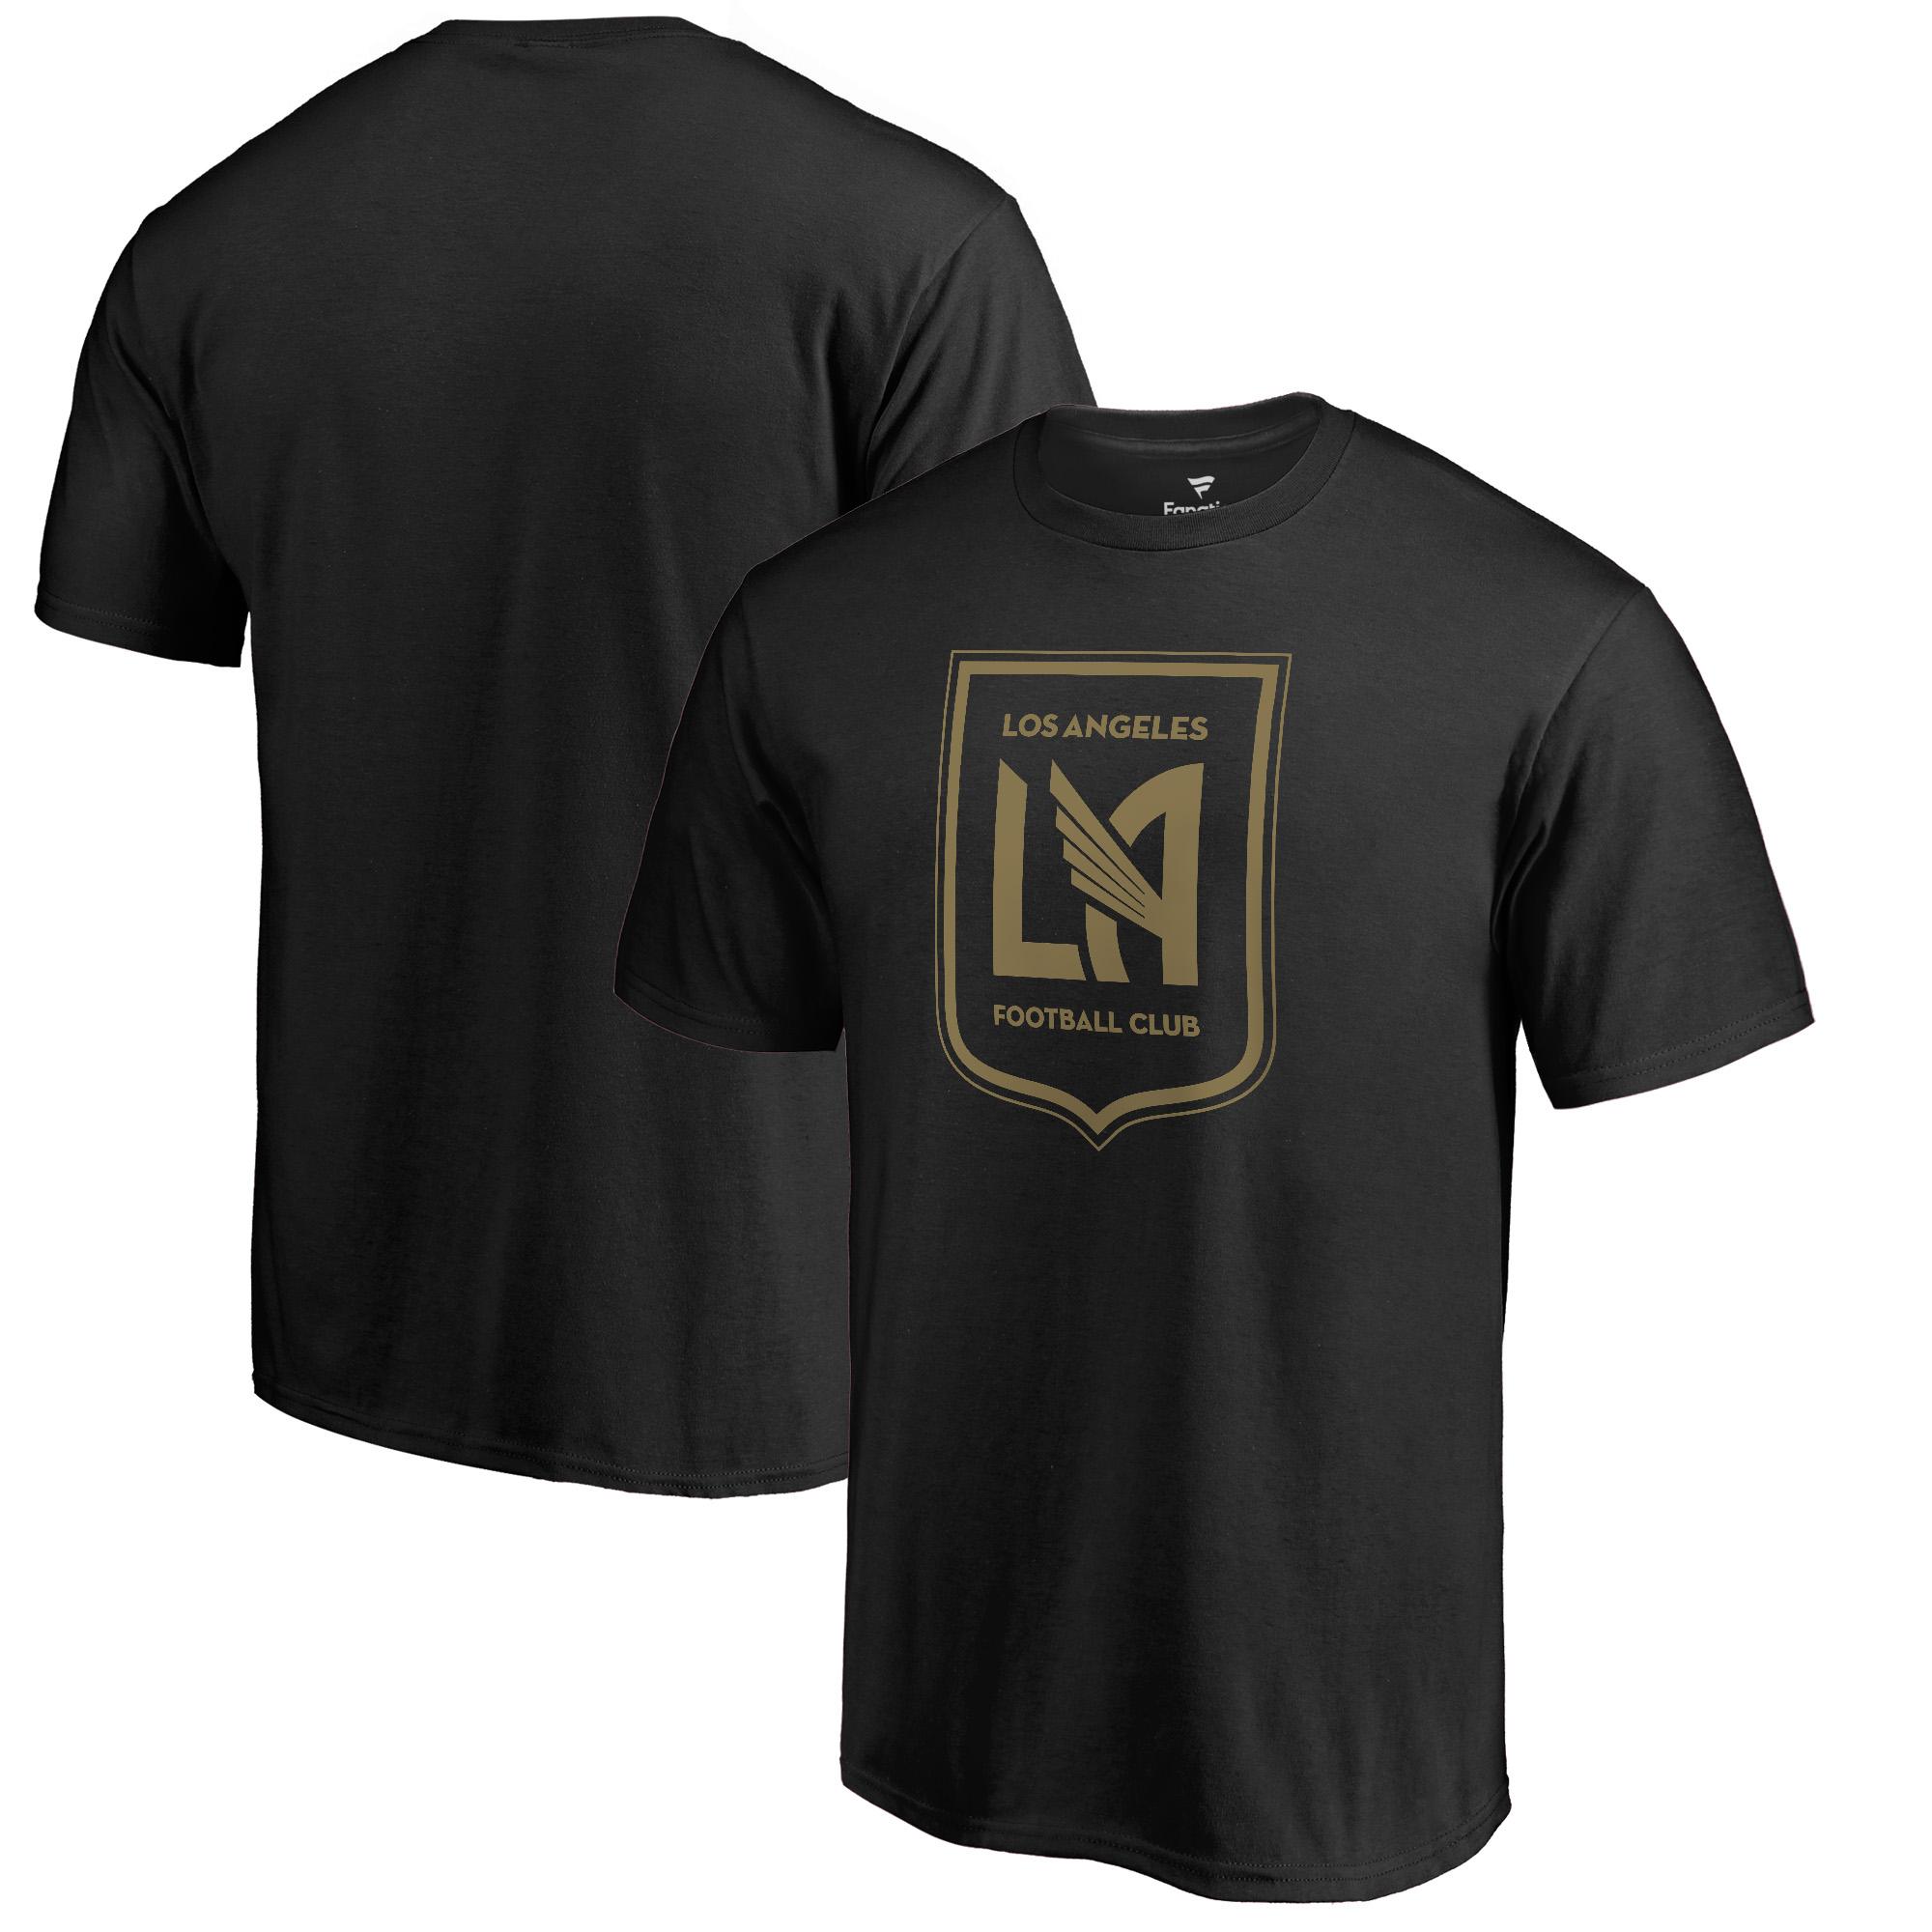 LAFC Fanatics Branded Primary Logo T-Shirt - Black